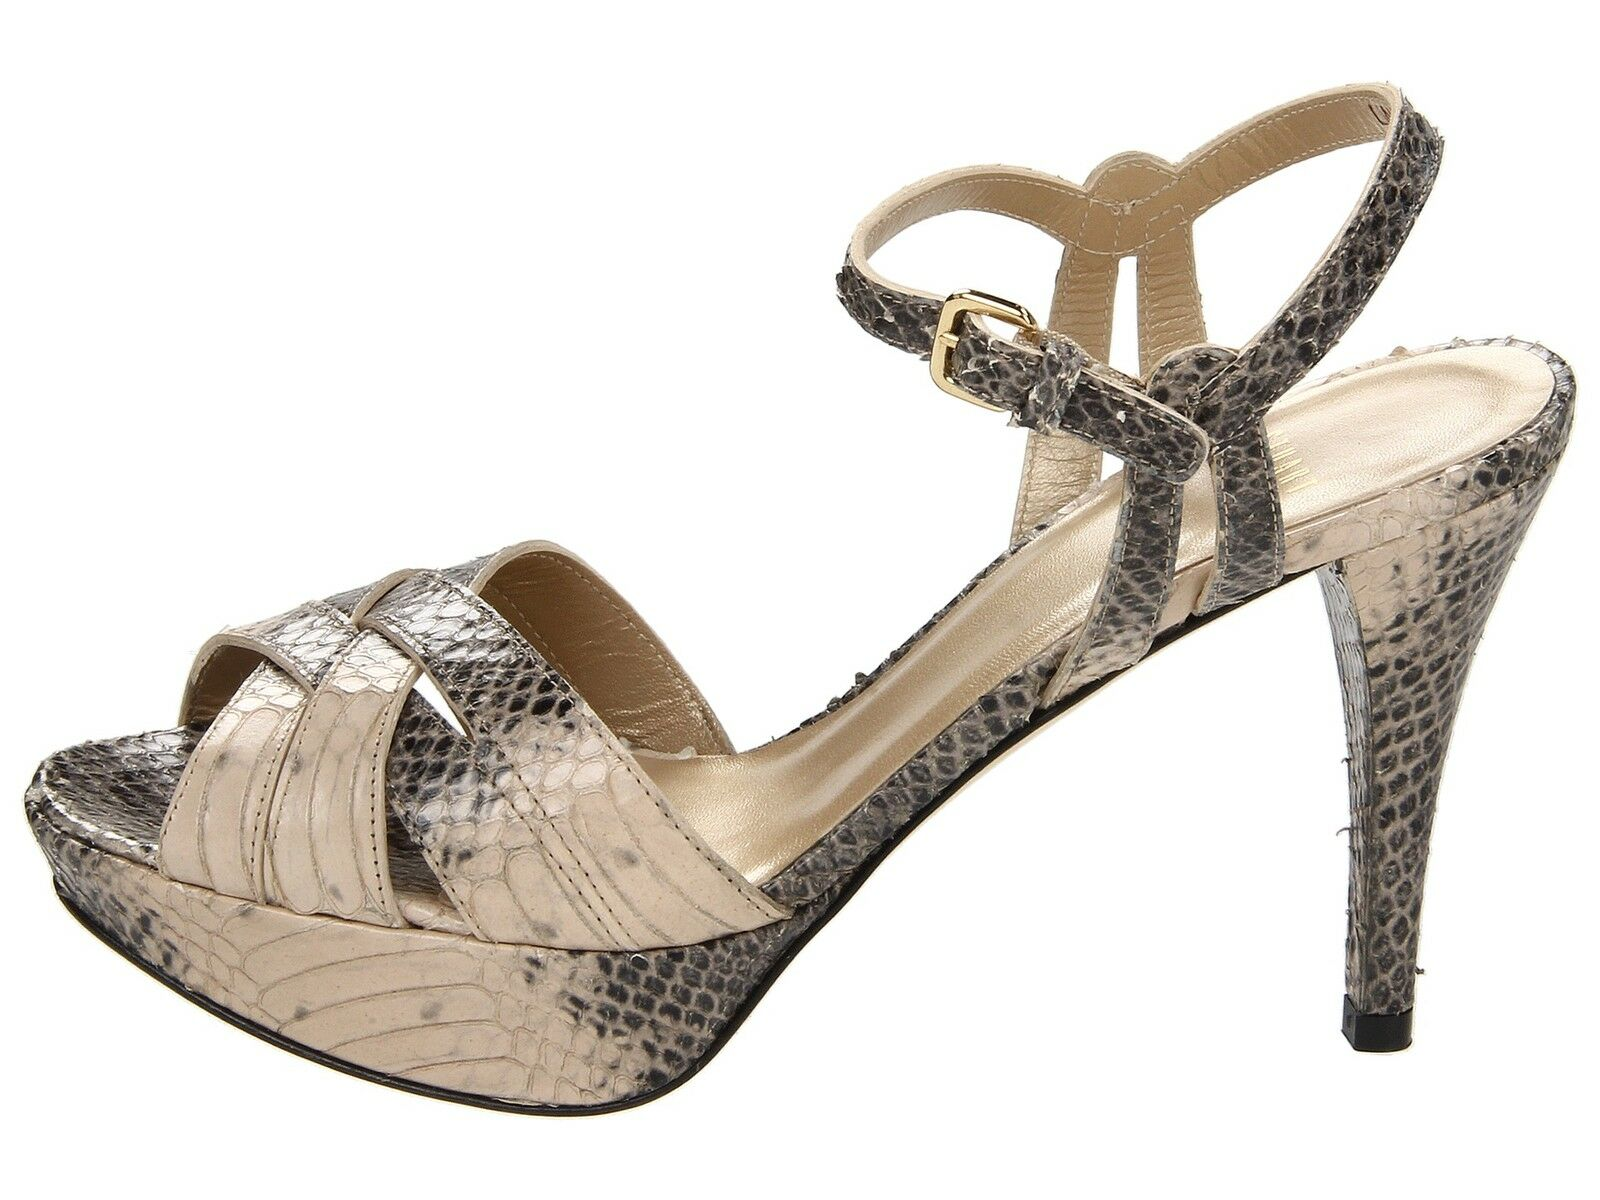 Stuart Weitzman Loopthru Bout Ougreen Ougreen Ougreen shoes Sandales Semelle Compensée 9 08fda3